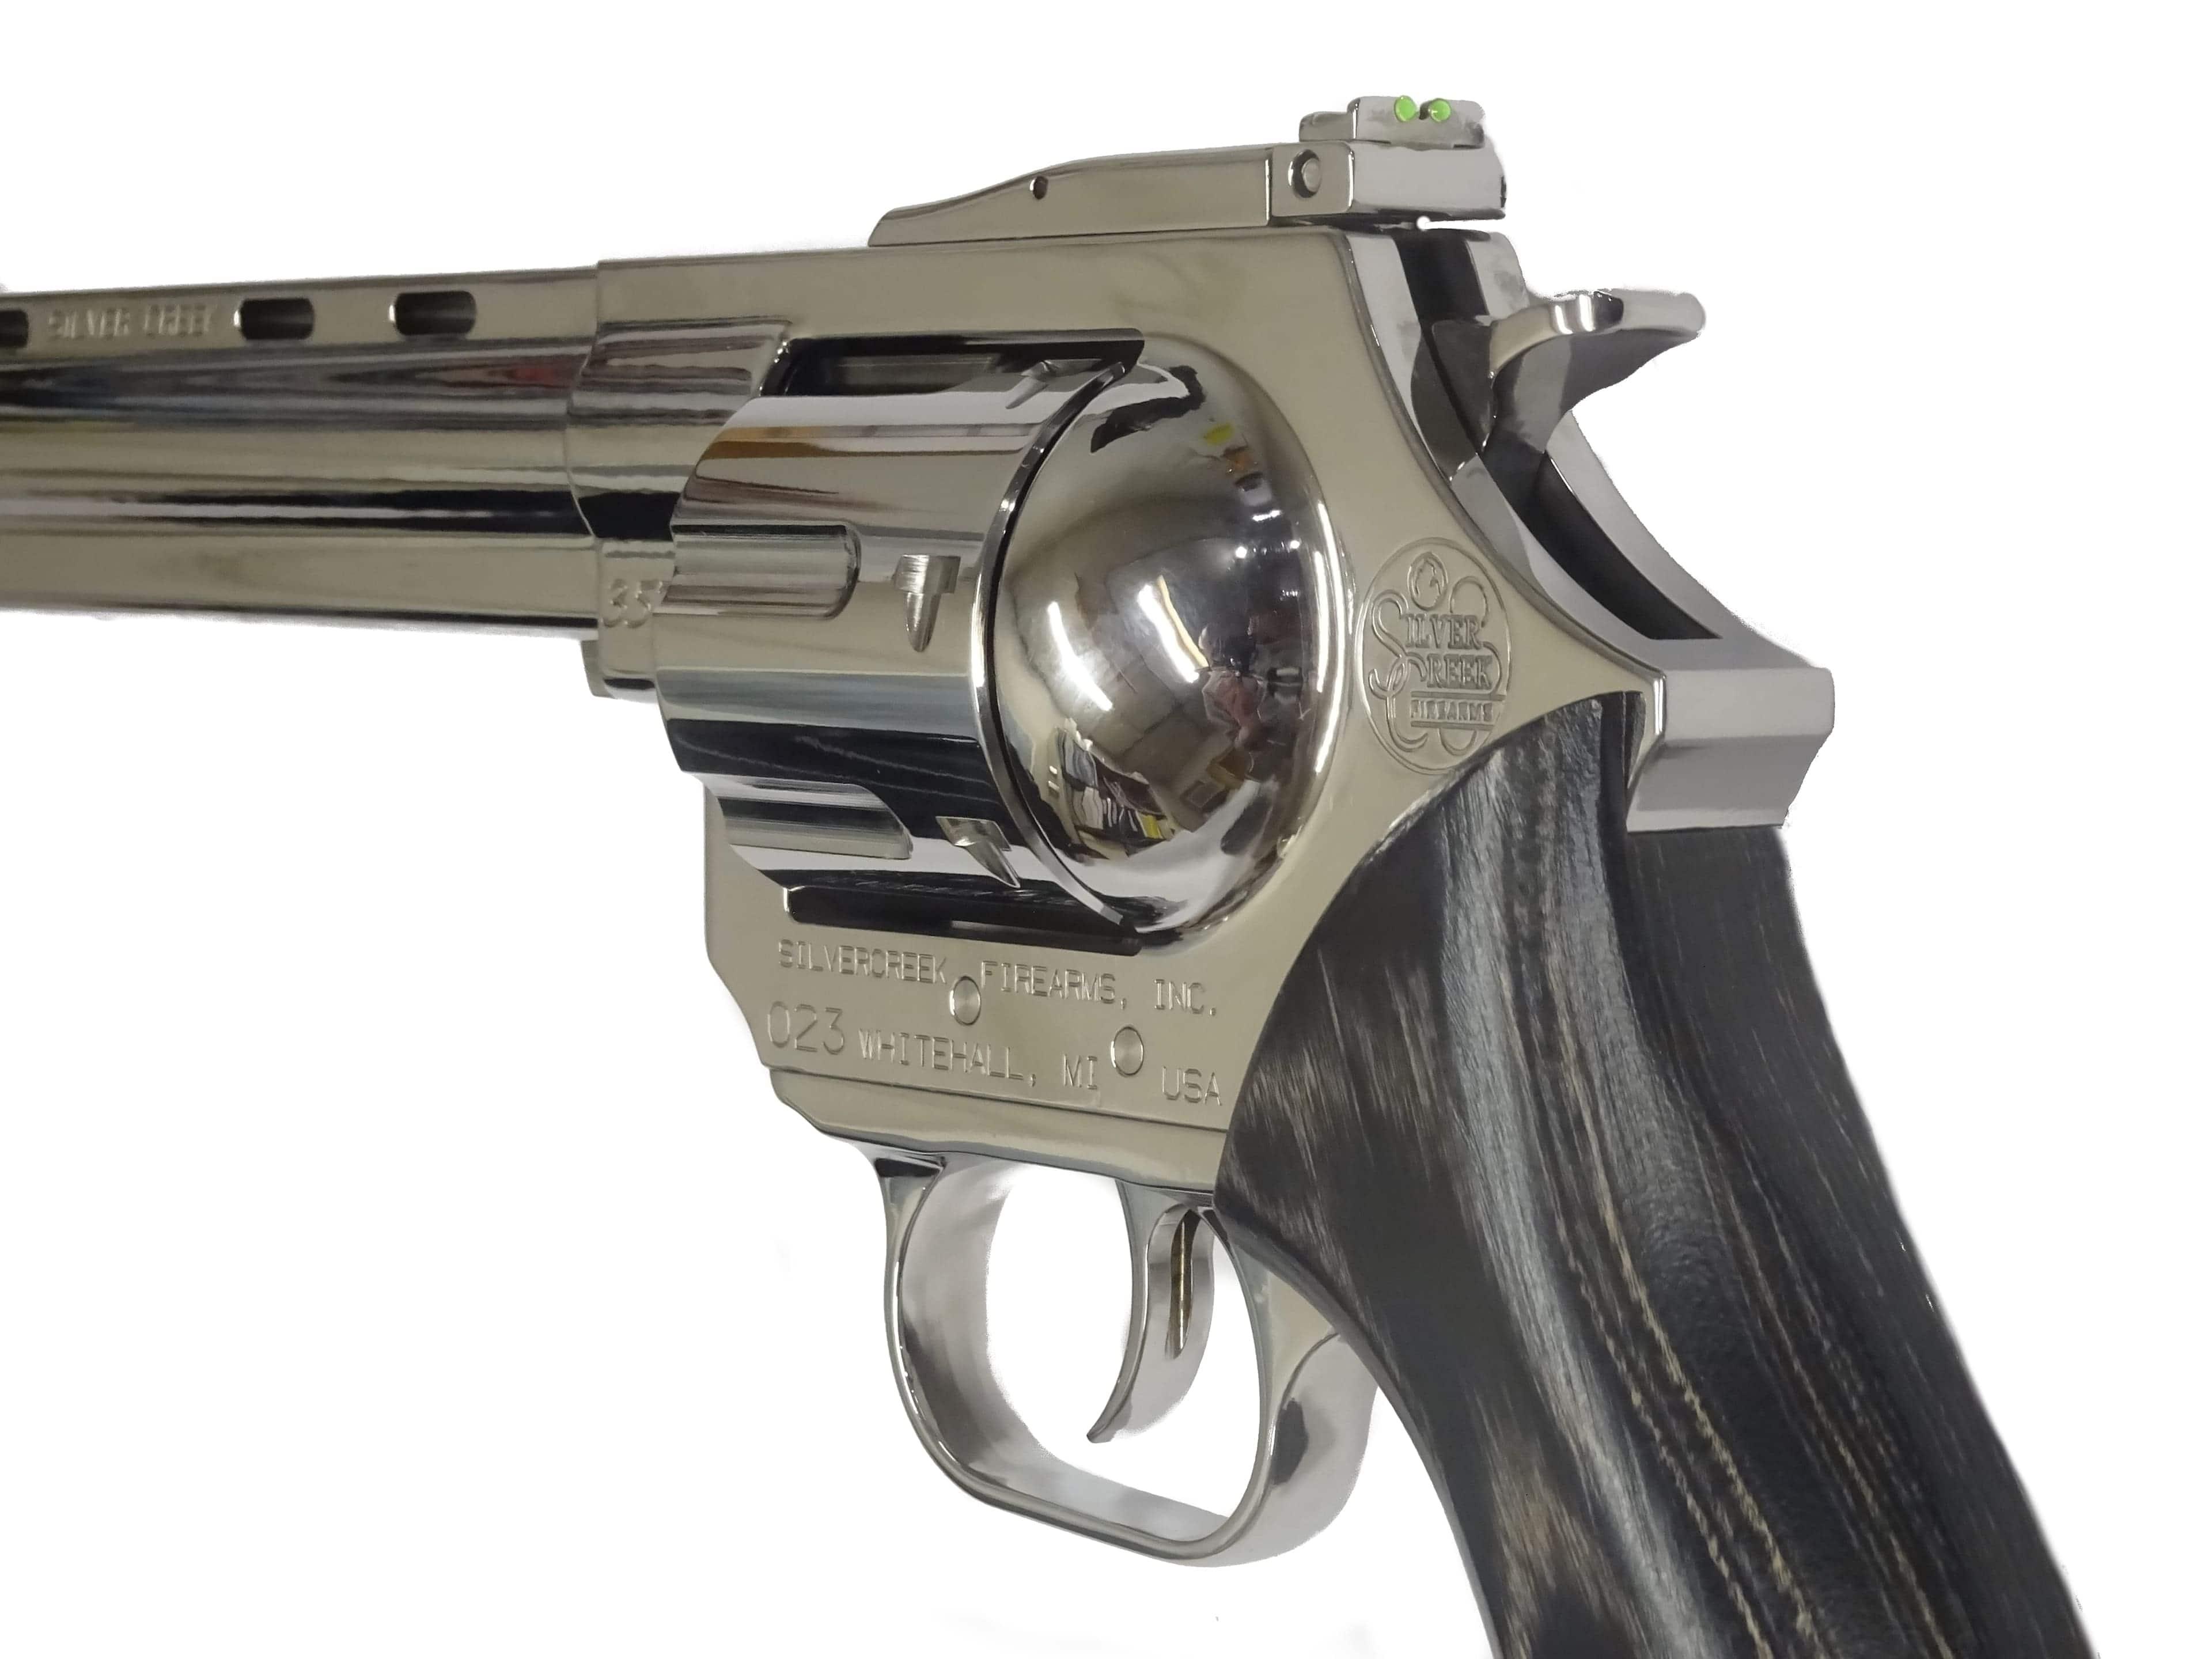 Home - Silver Creek Firearms, Inc. - Made In Michigan